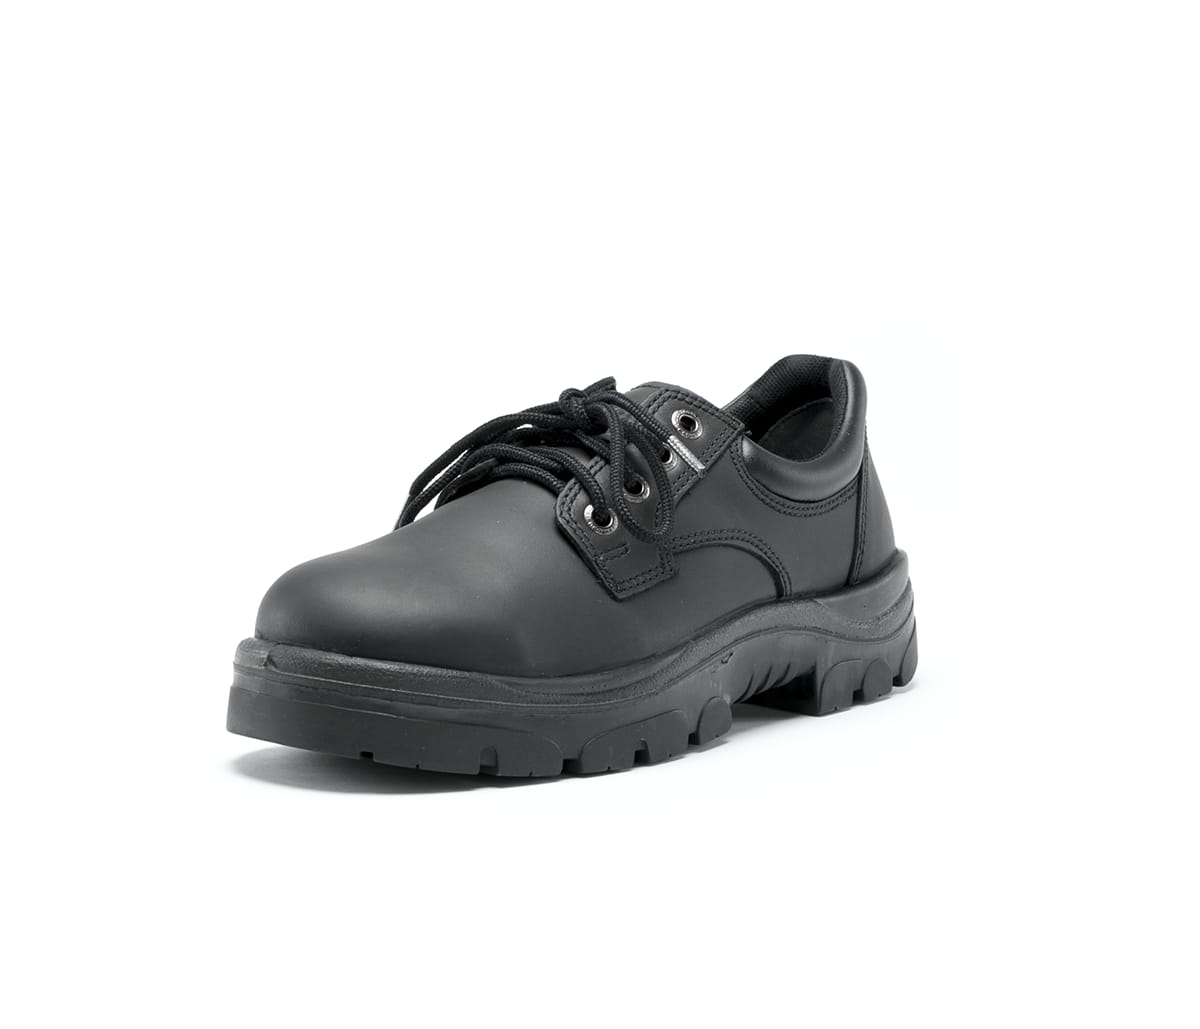 1a9520e108ca Eucla Steel Toe Cap Lace-Up Work Shoe